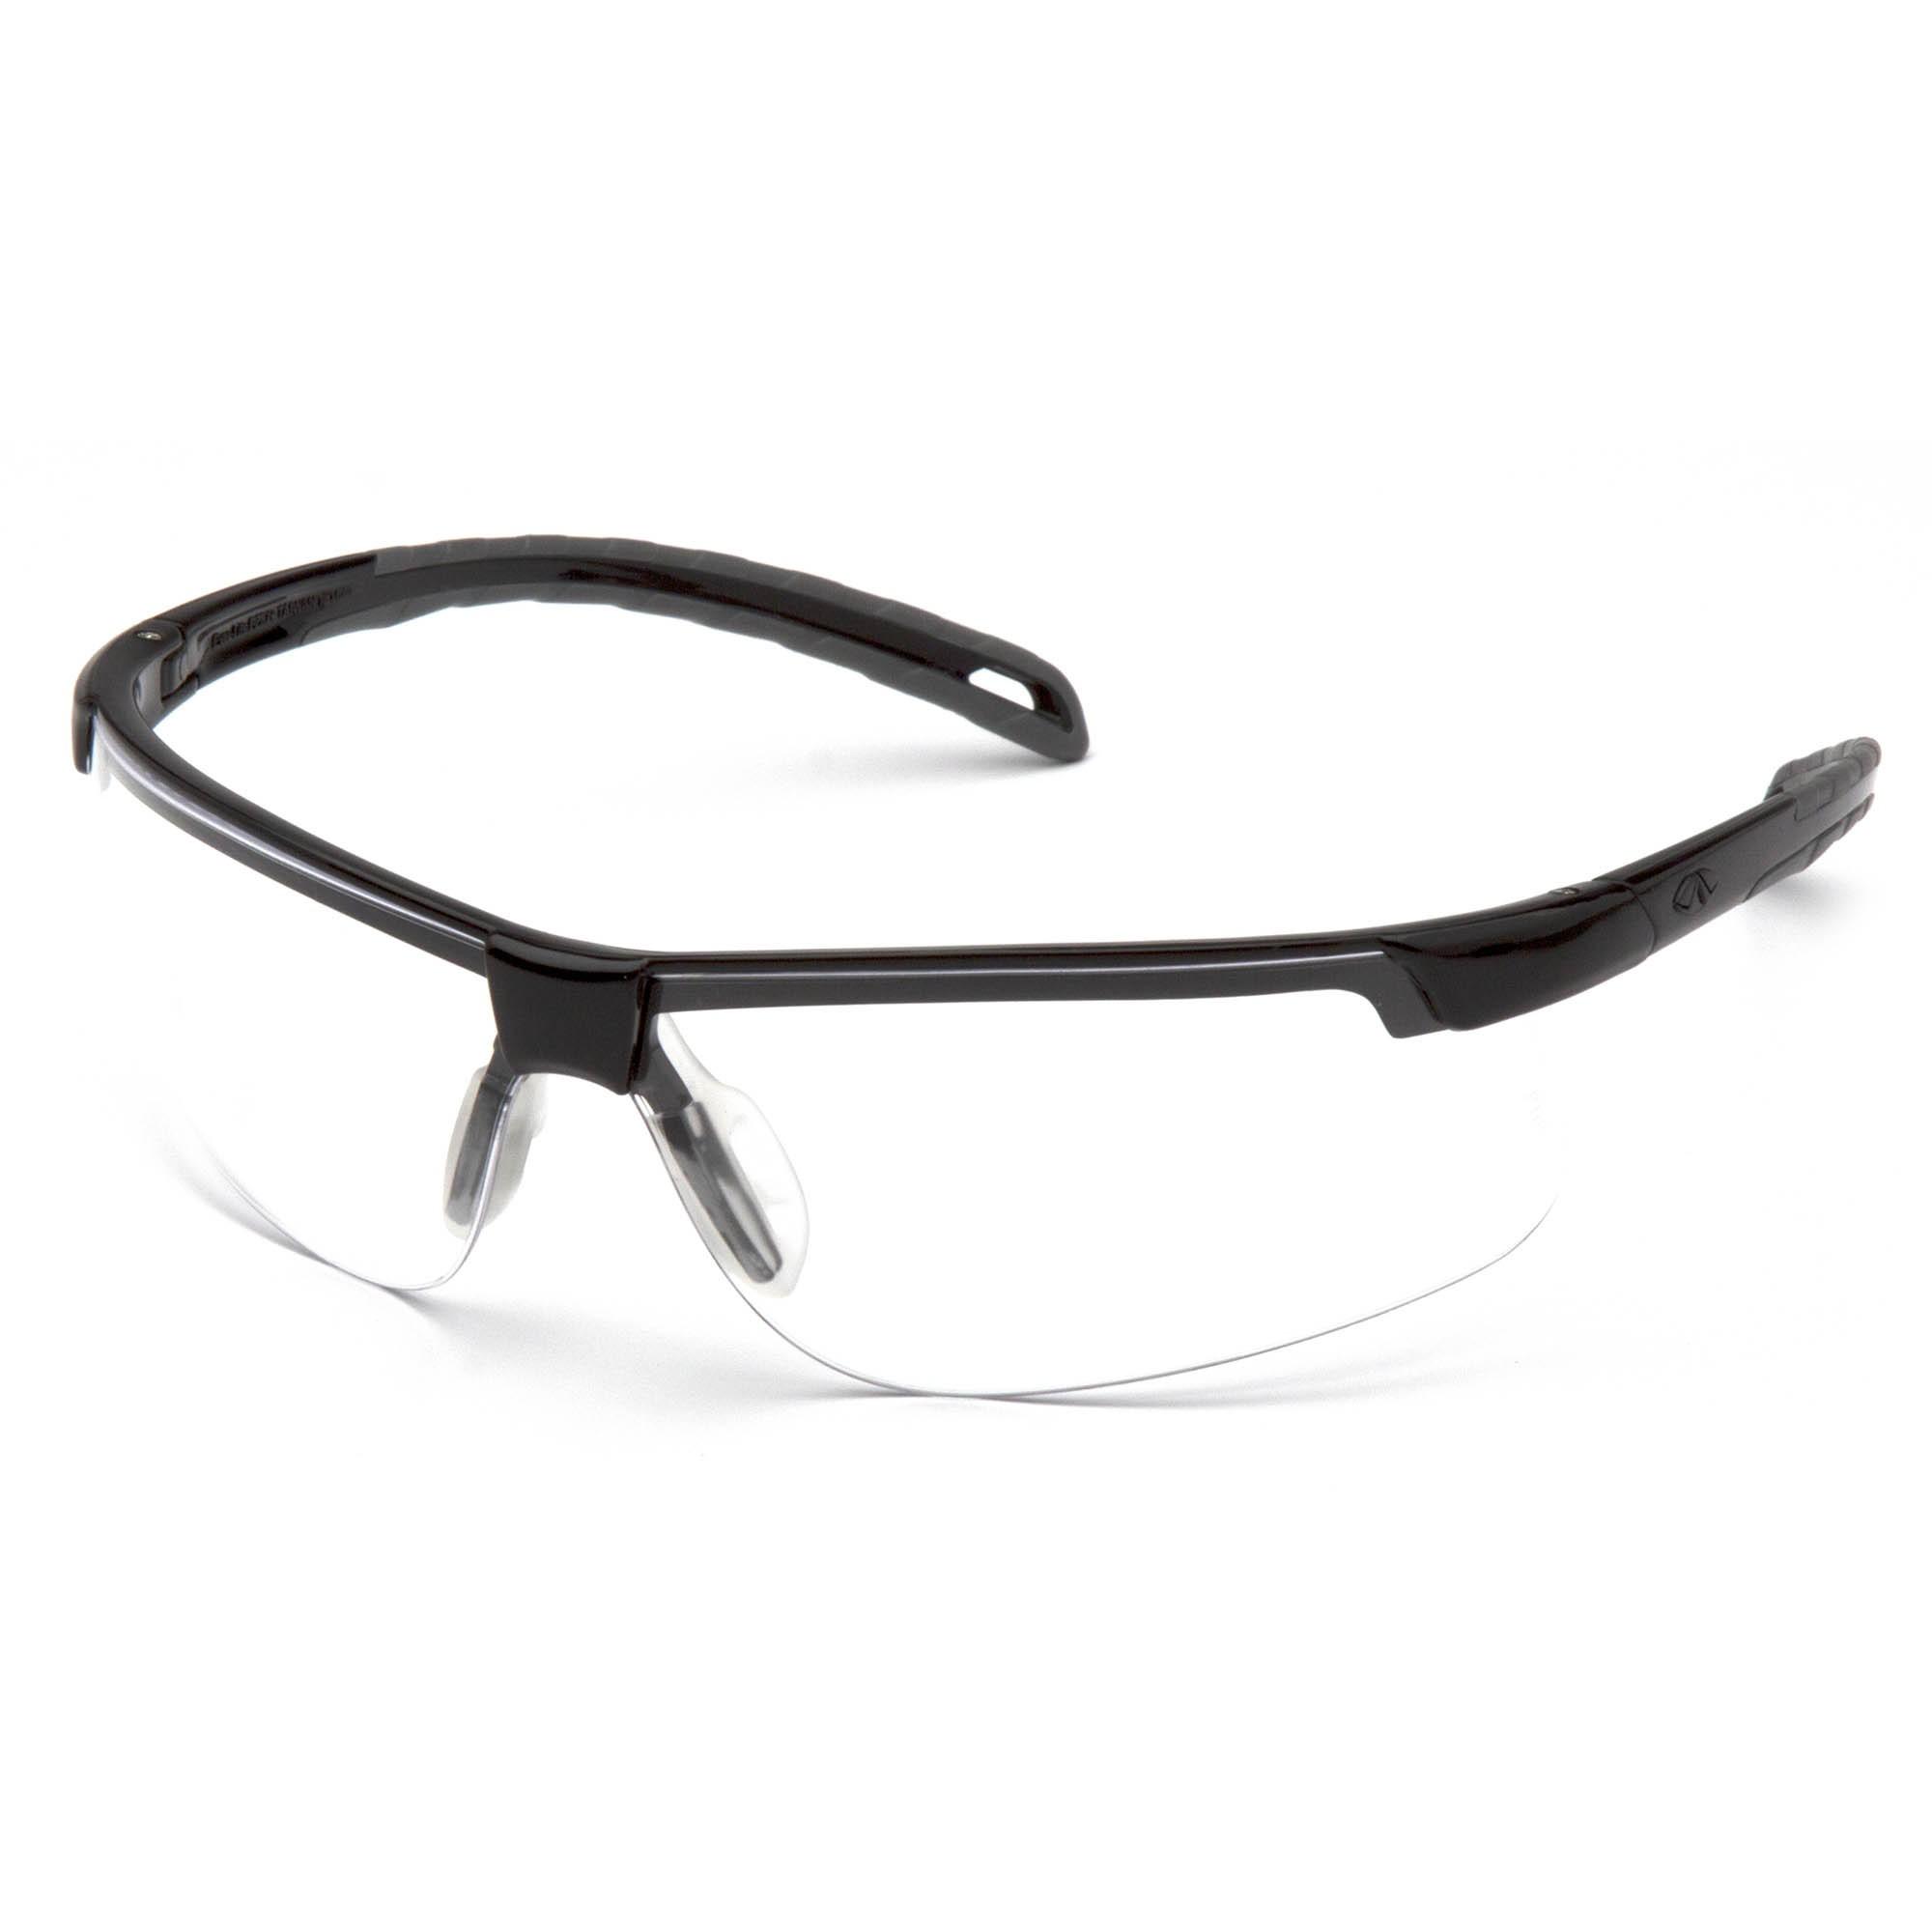 Black Frame Glasses With Clear Lenses : Pyramex Ever-Lite Safety Glasses - Black Frame - Clear ...